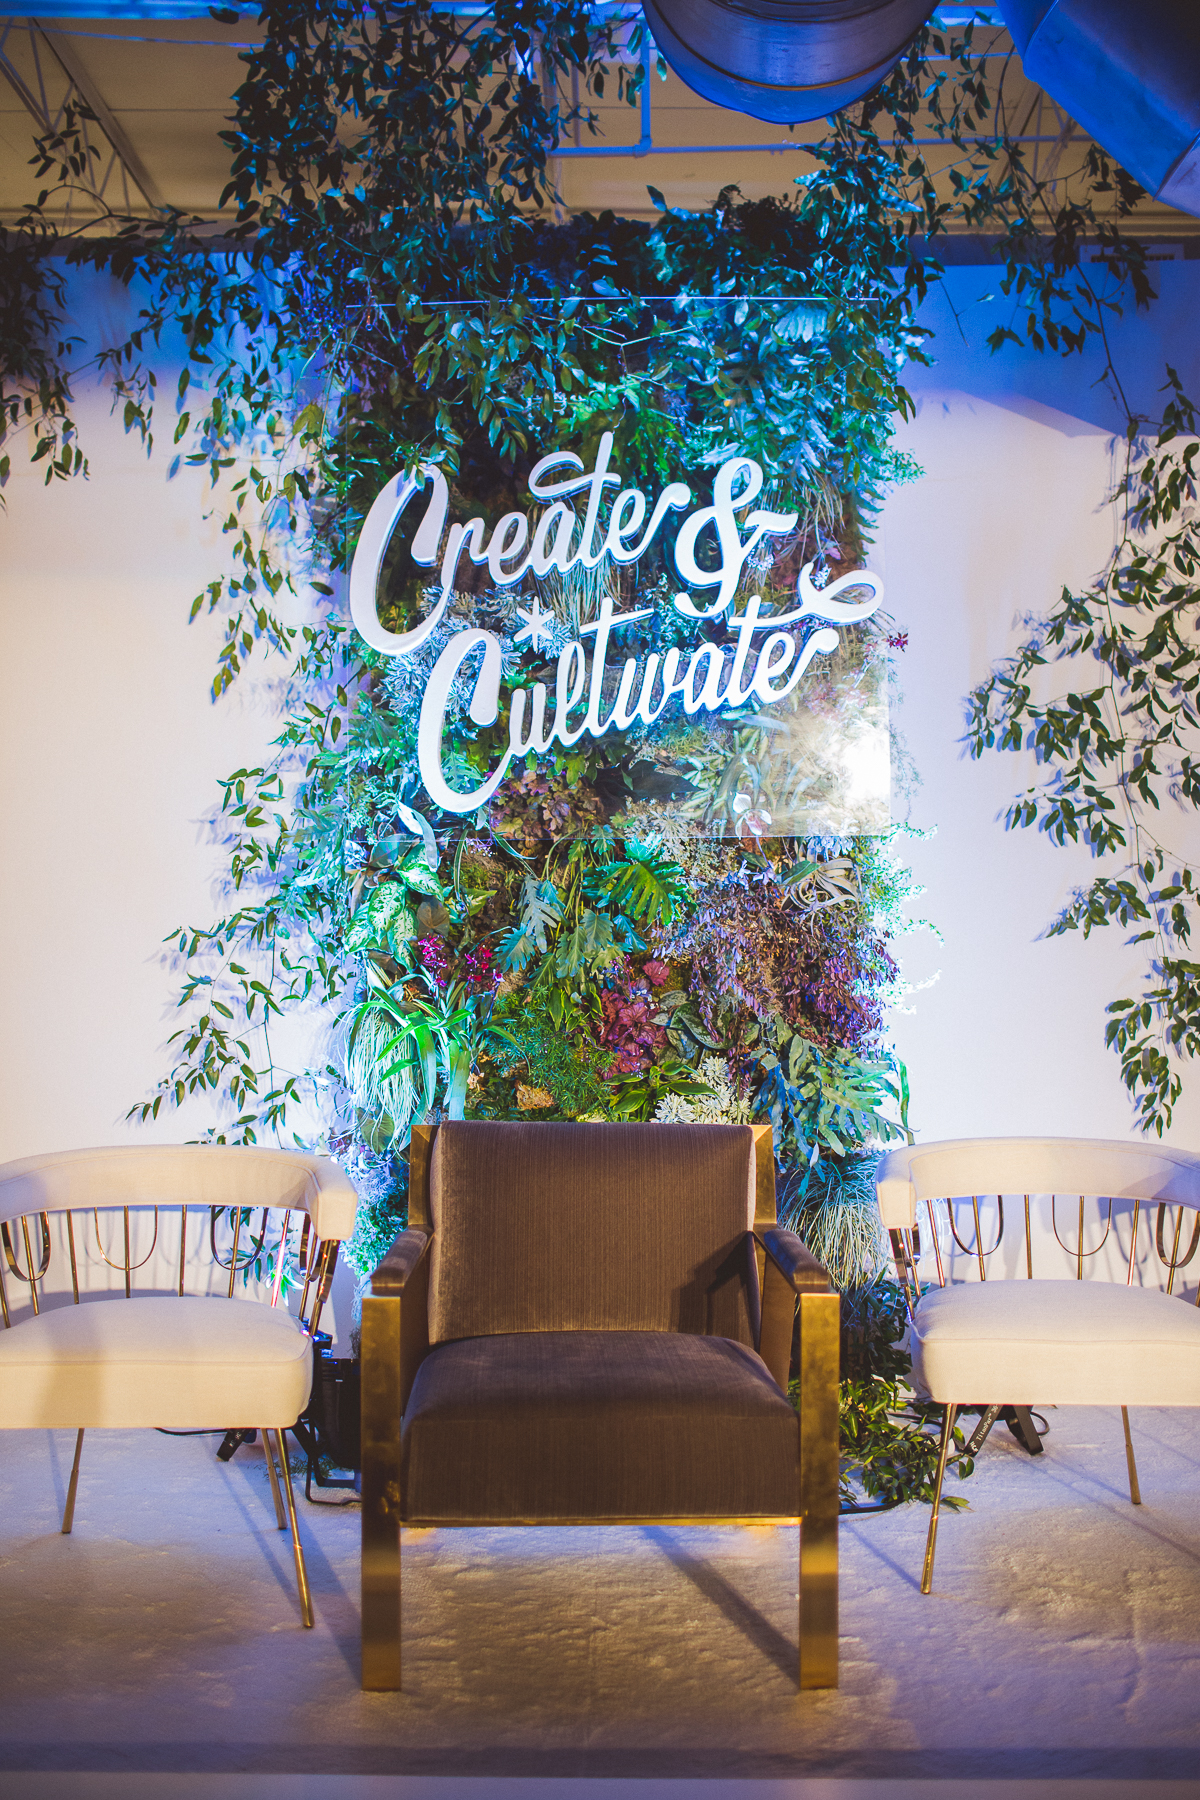 create-cultivate-atl-kelley-raye-atlanta-lifestyle-photographer-12.jpg